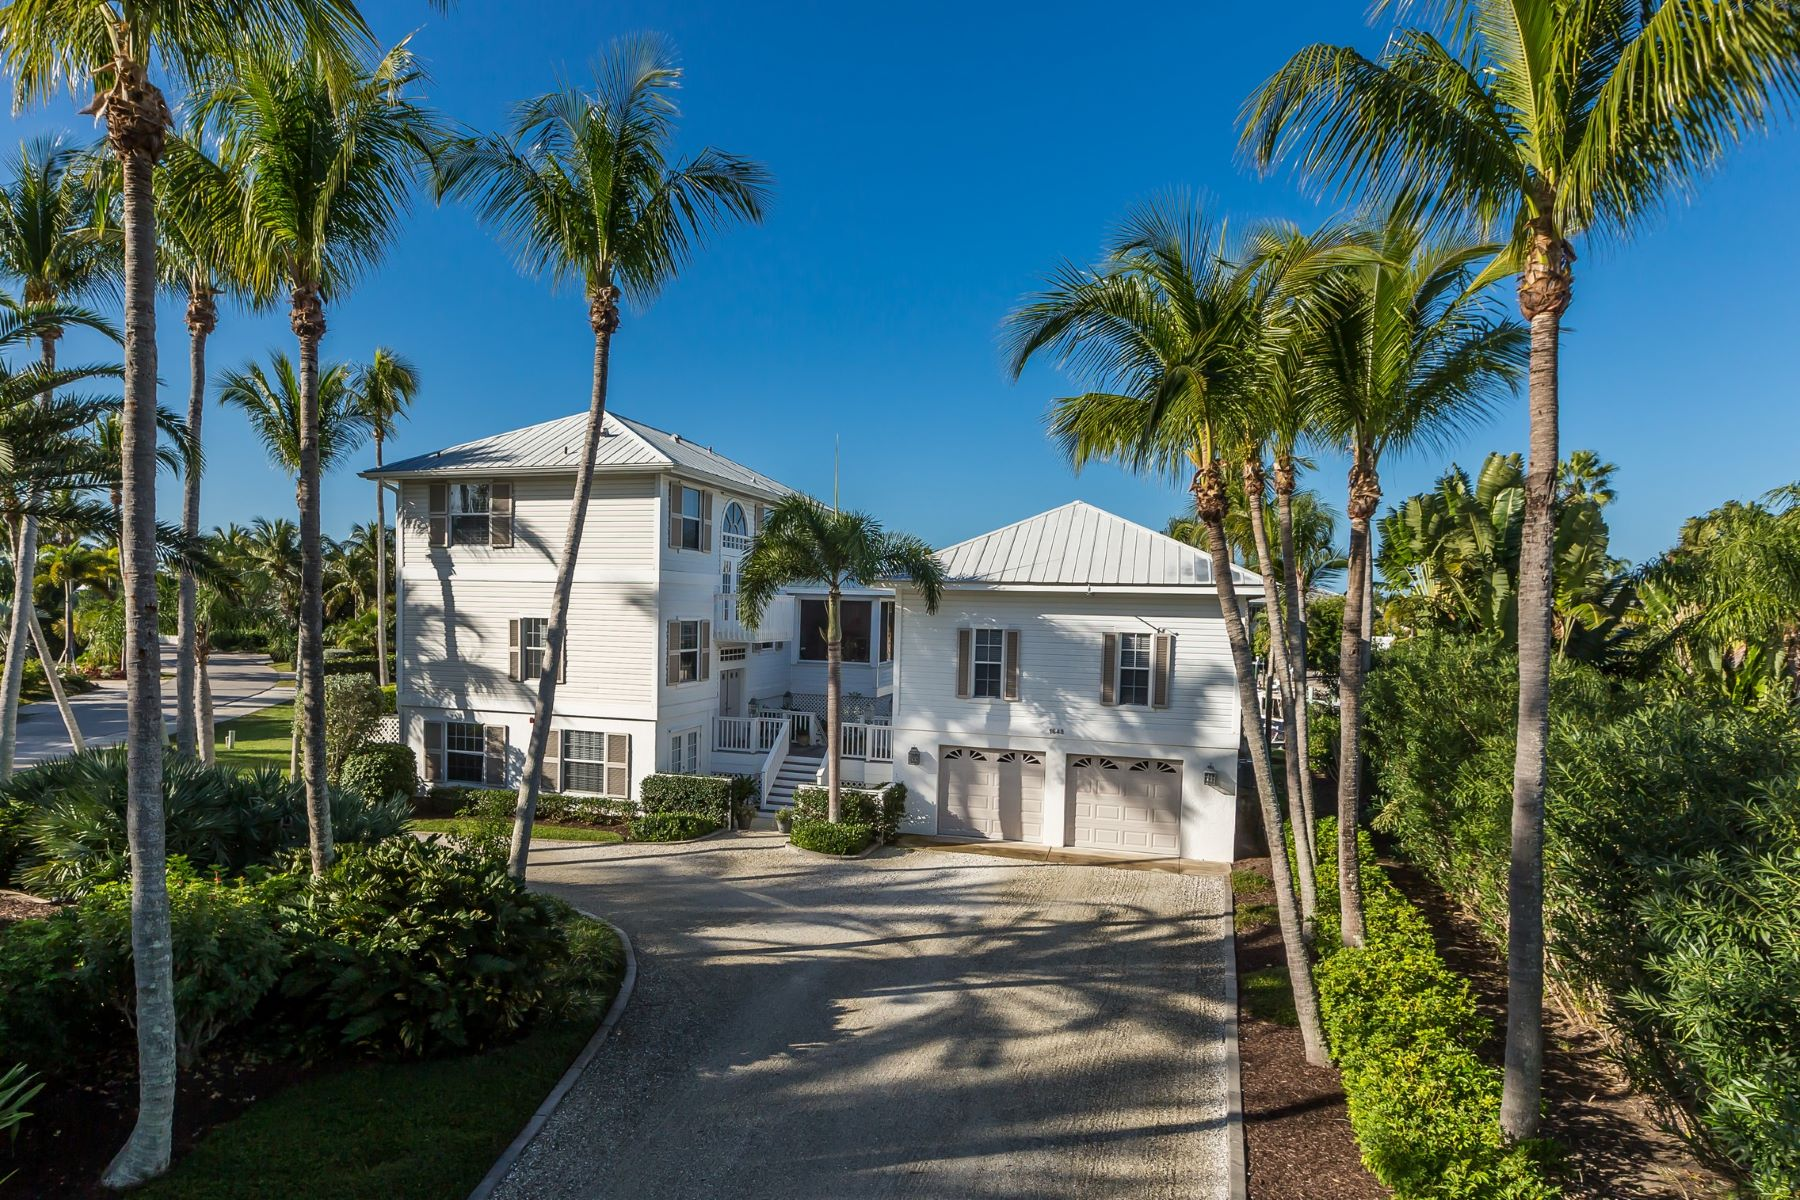 Single Family Homes for Sale at 1643 Jean Lafitte Drive Boca Grande, Florida 33921 United States